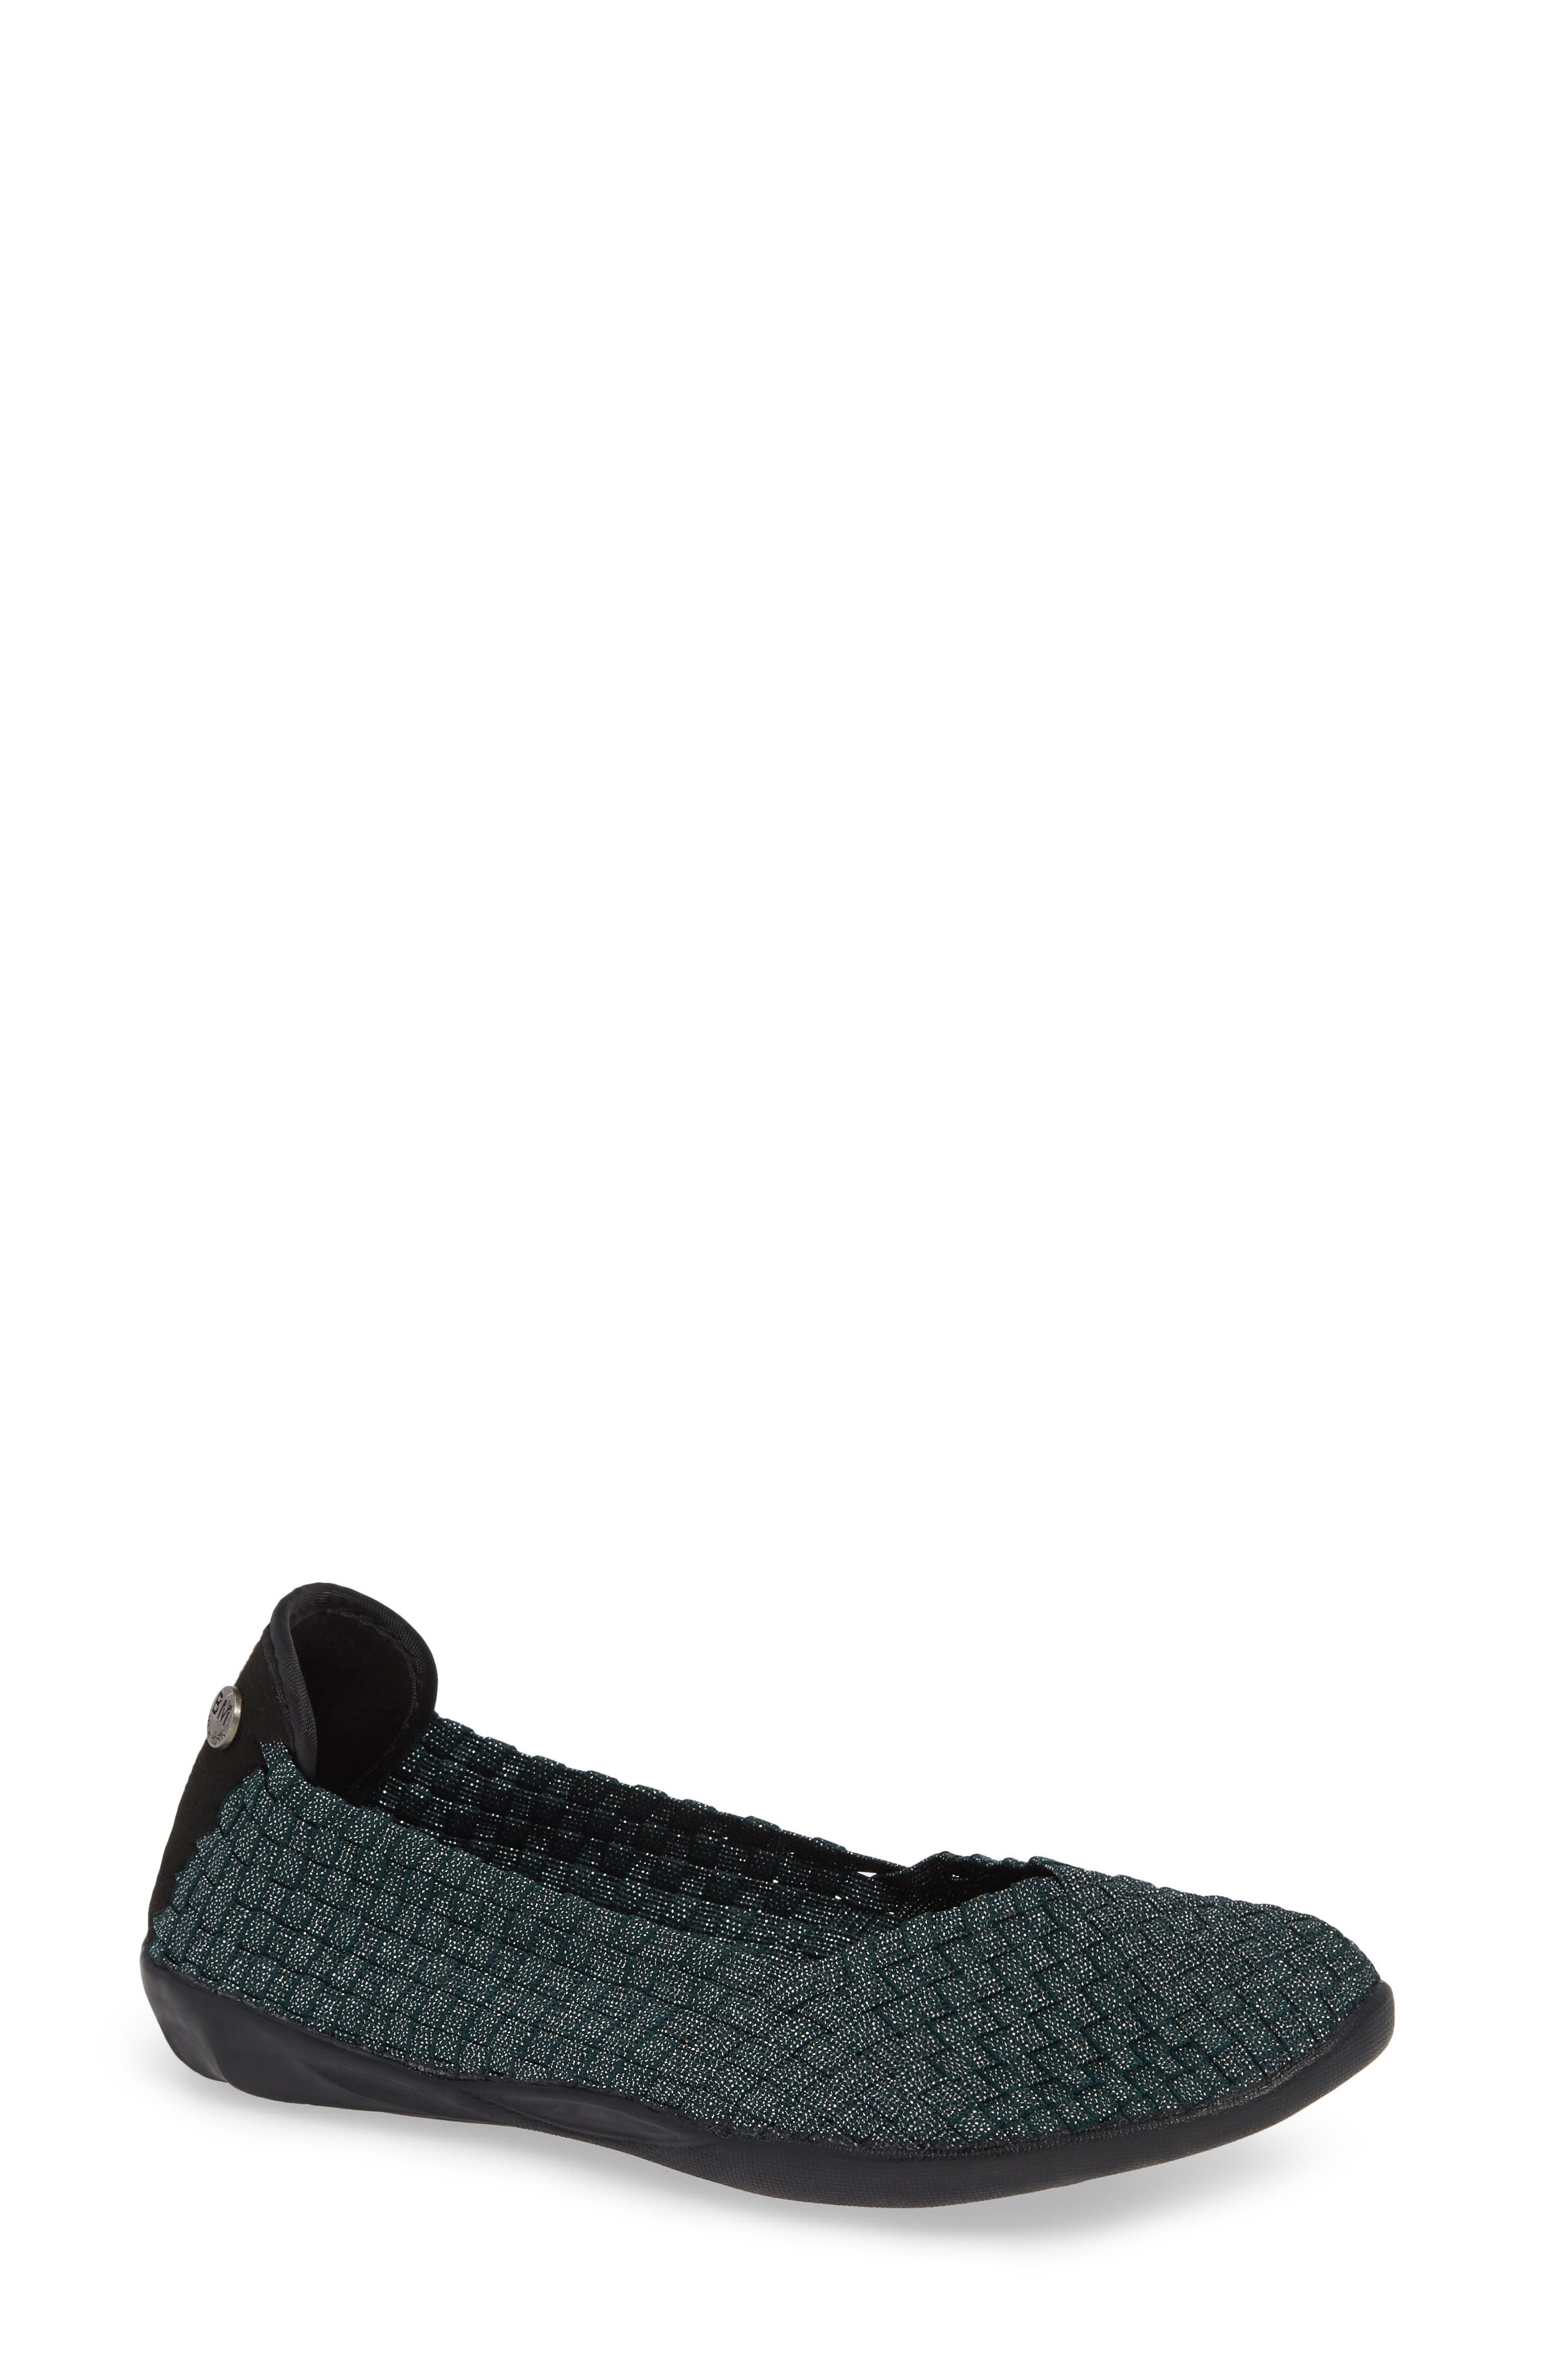 Catwalk Sneaker,                             Main thumbnail 1, color,                             DEEP GREEN SHIMMER FABRIC